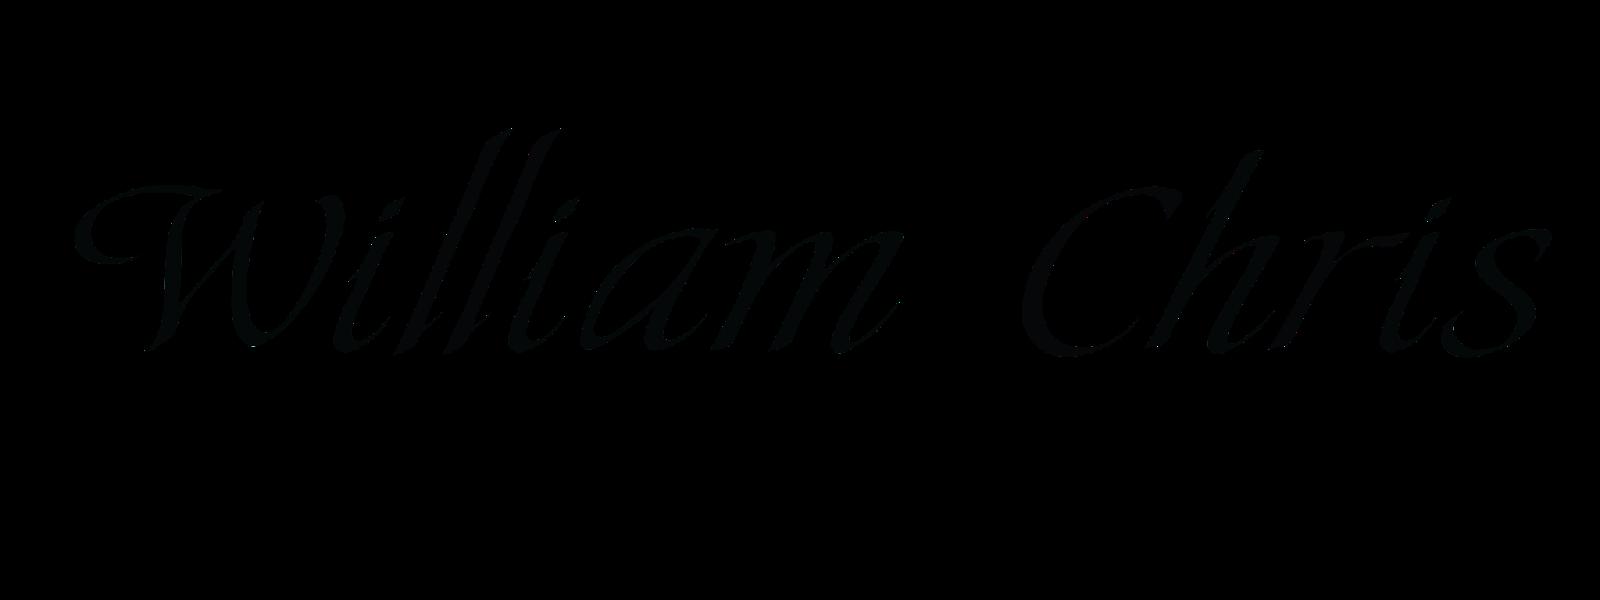 WilliamChris_logo_letter_final_ago15-01.png